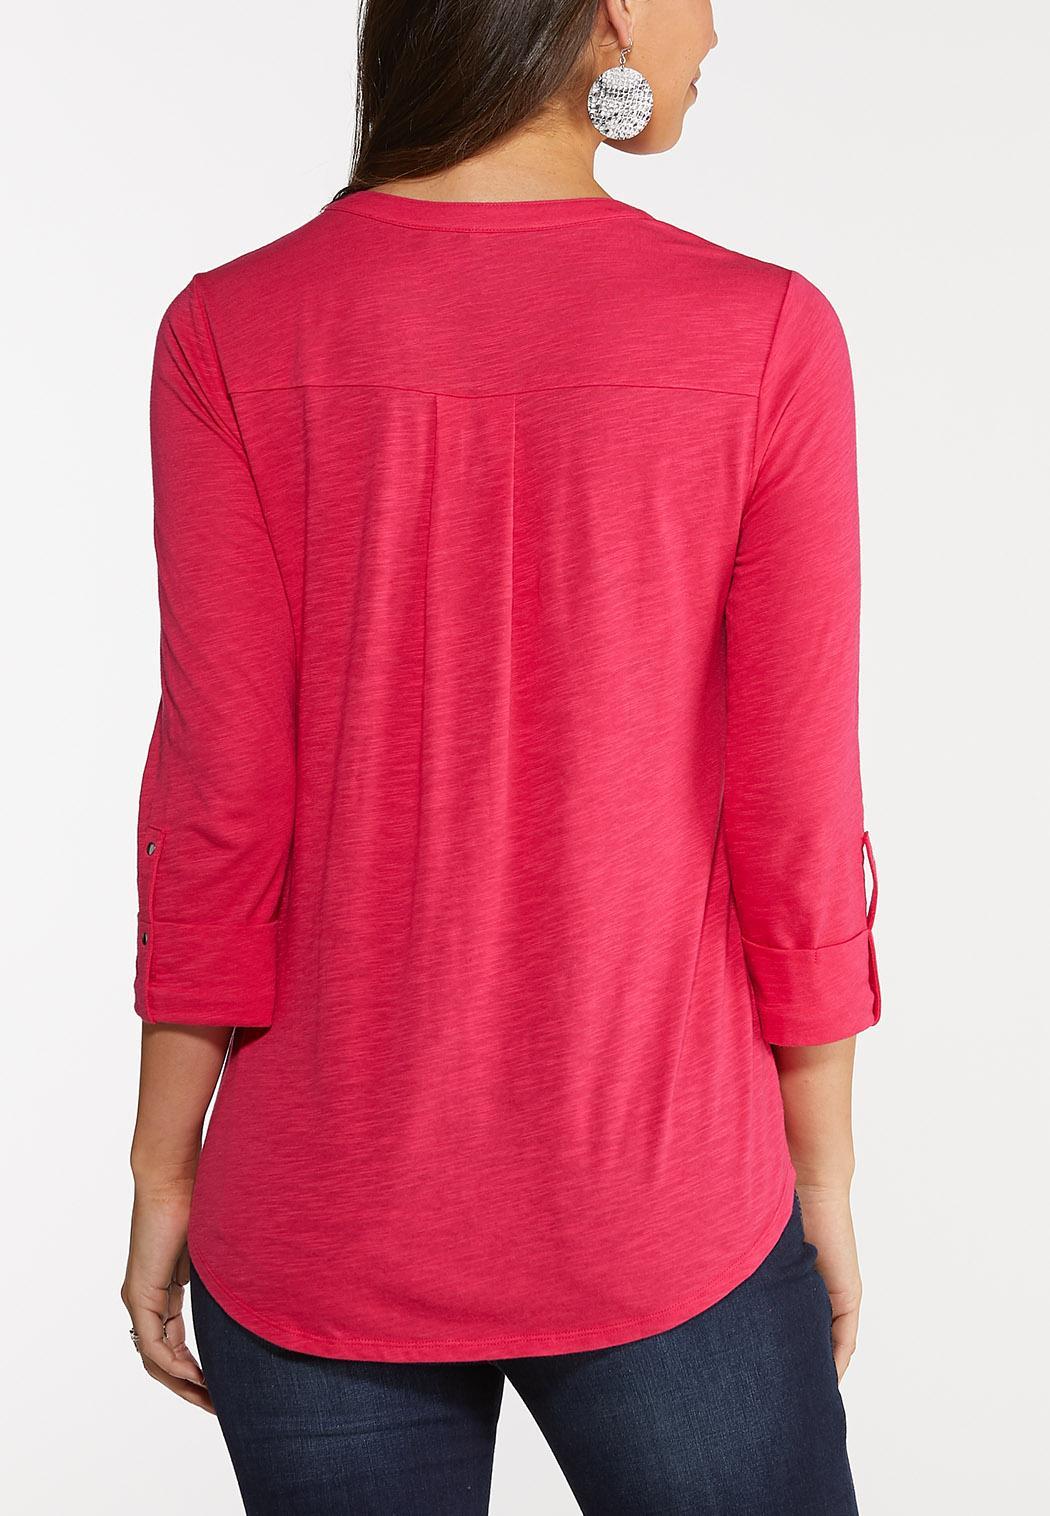 Lace Up Pocket Top (Item #44007858)